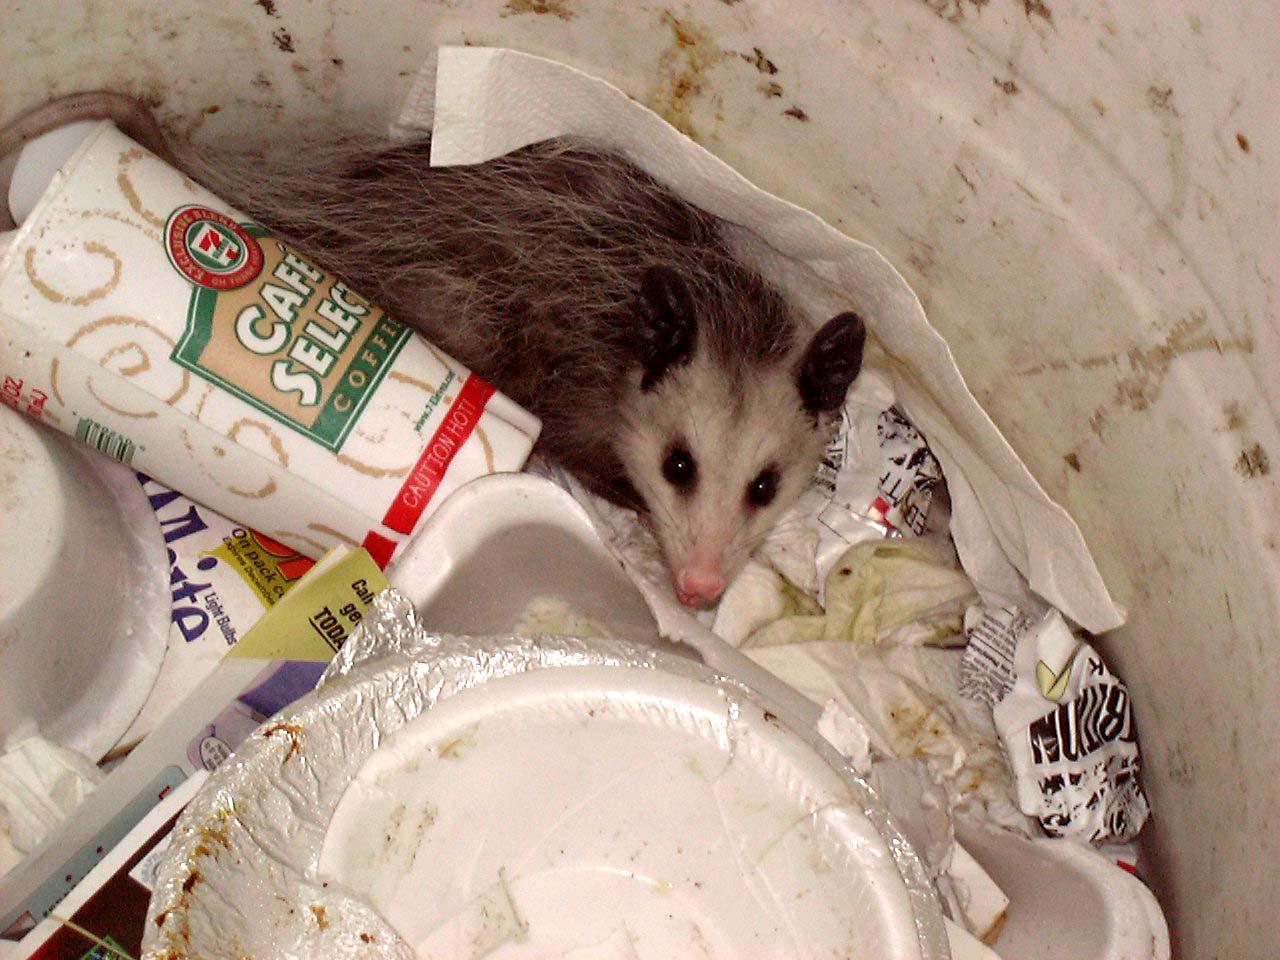 Possum in trash can